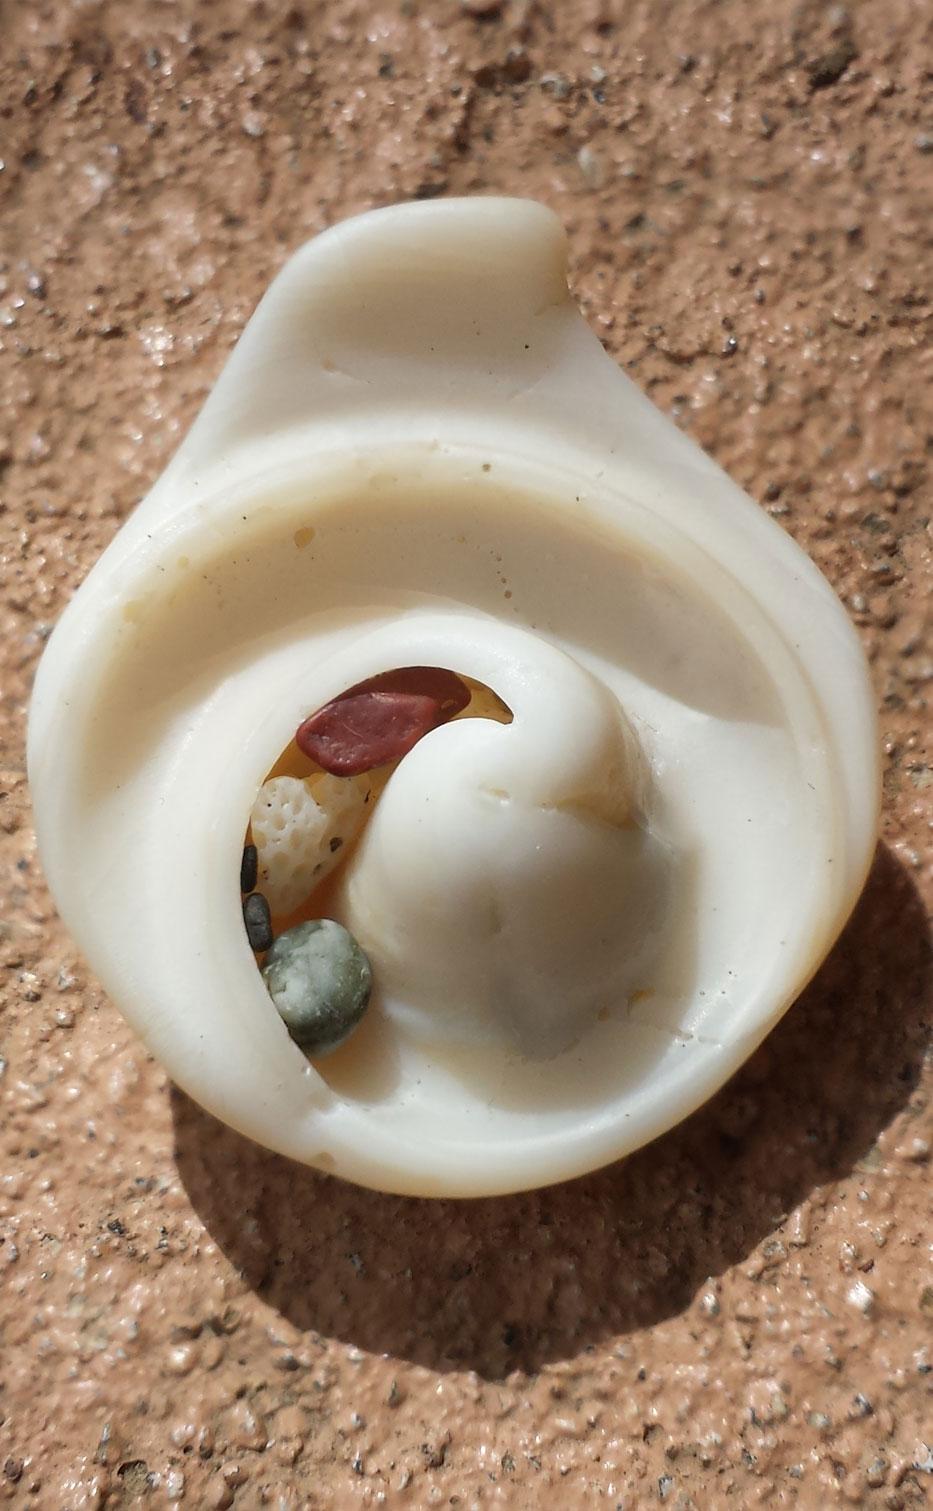 Pacific ocean shell Samara Costa Rica